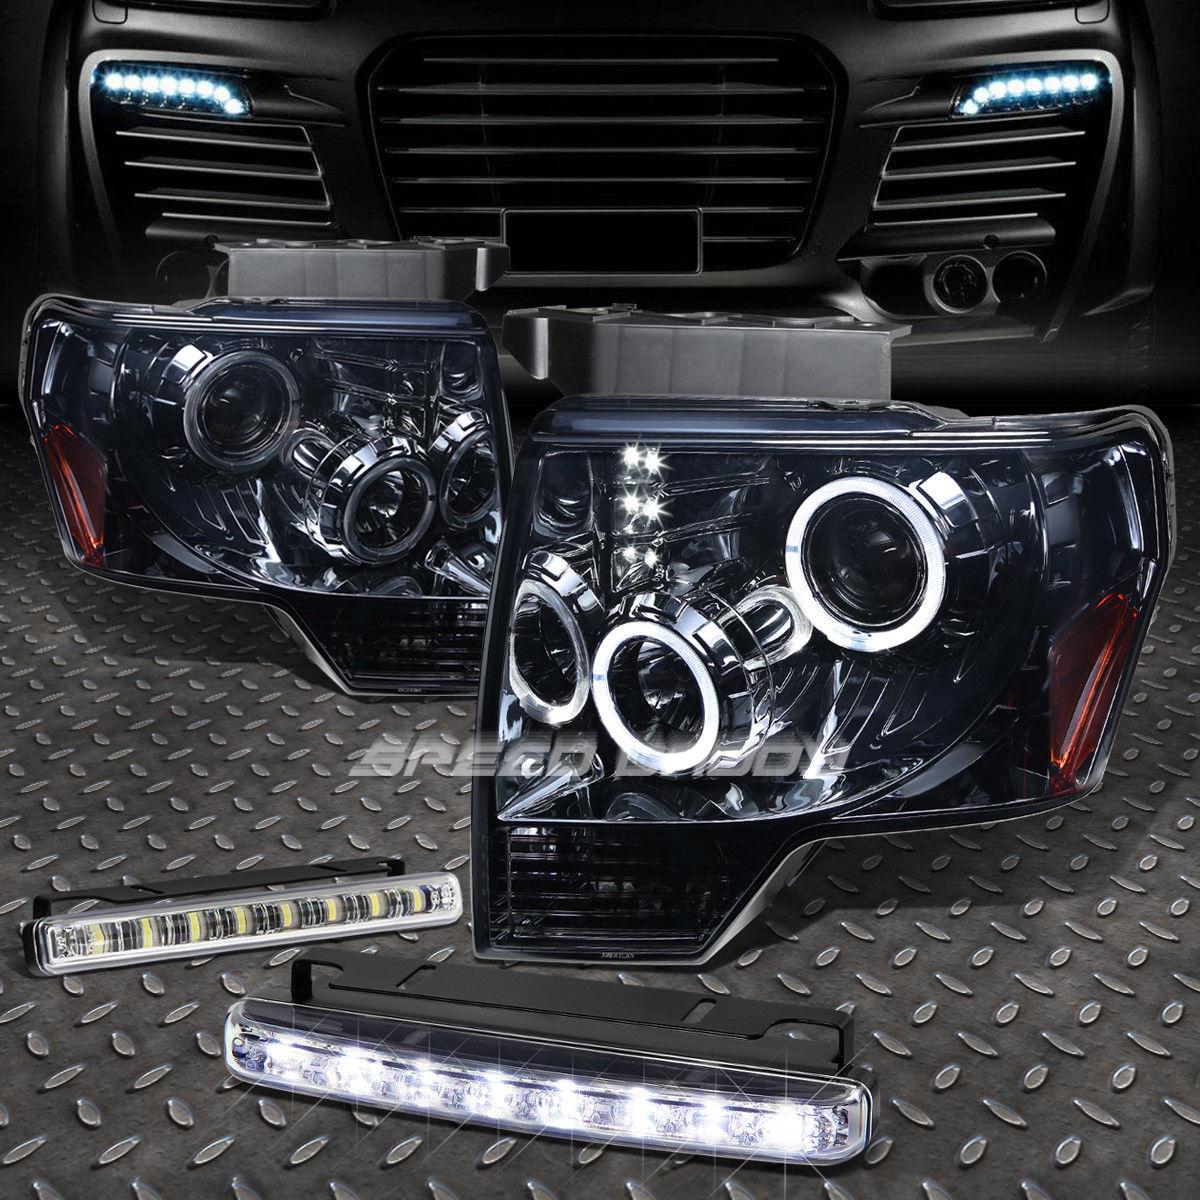 USフォグライト HALO PROJECTOR LED SMOKED HEADLIGHT+8 LED GRILL FOG LIGHT FOR 09-14 F150 PICKUP ハロープロジェクターLEDヘッドライト+ 9-14 F150ピックアップ用8 LEDグリルフォグライト